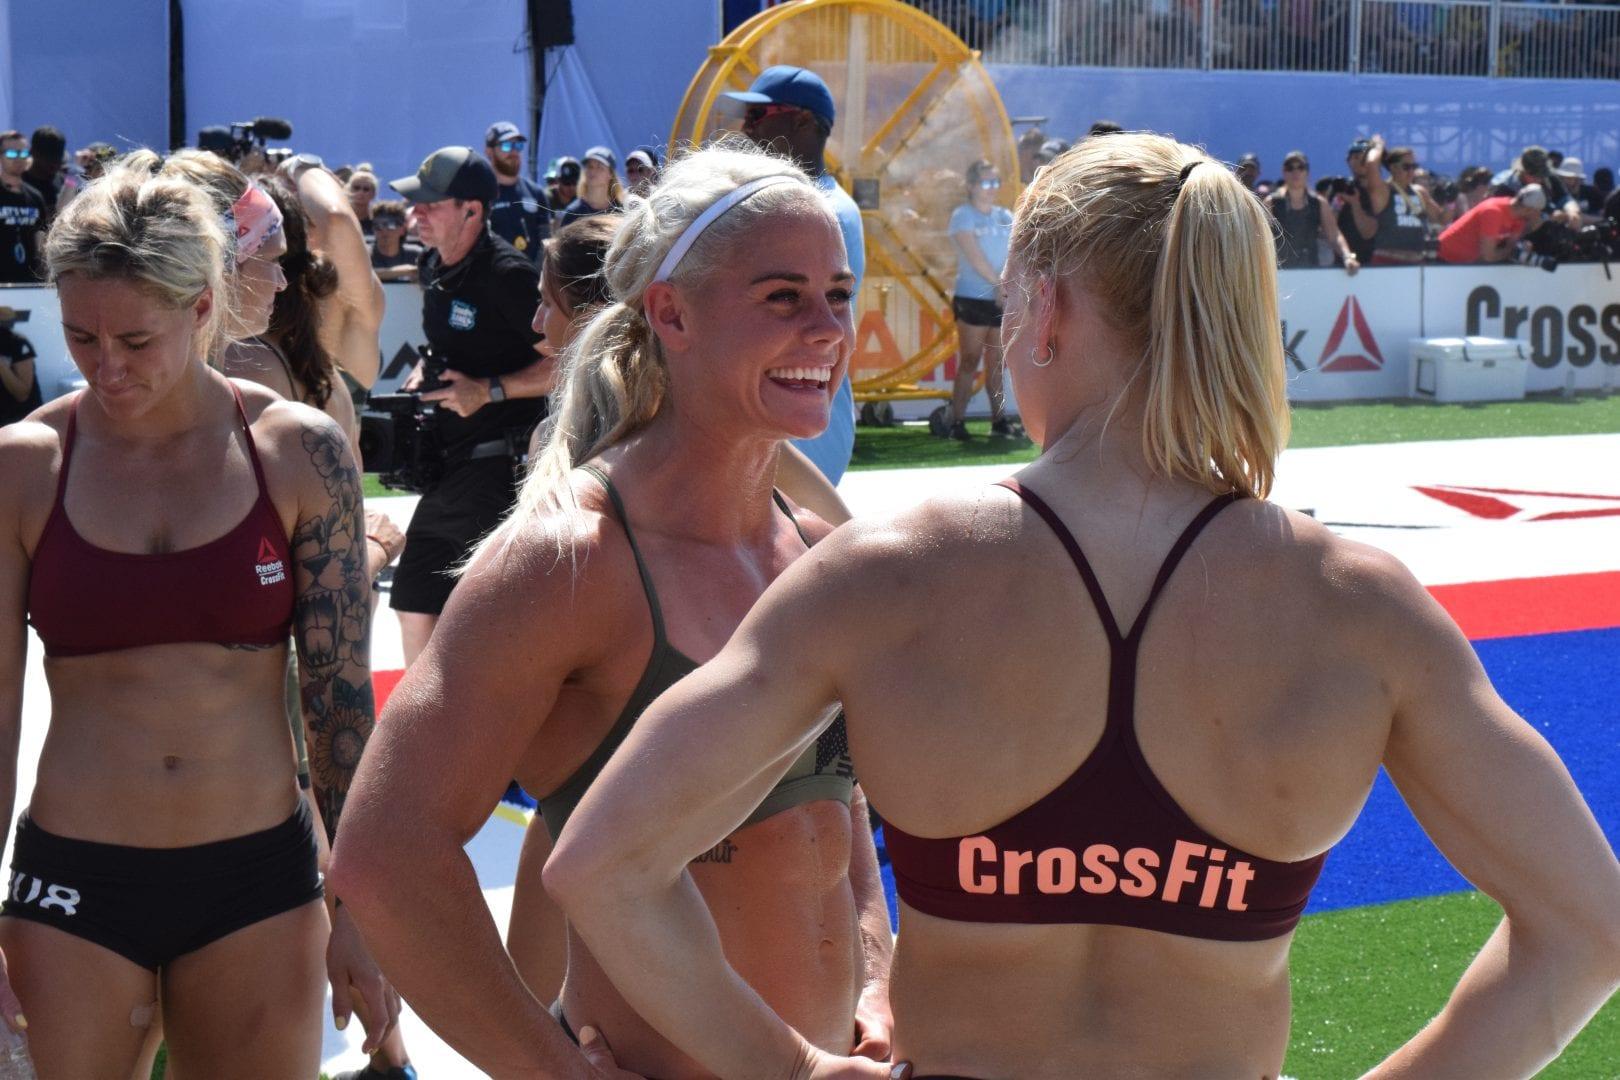 Sara Sigmundsdottir and Annie Thorisdottir talk on the sideline of the Sprint event at the 2019 CrossFit Games.